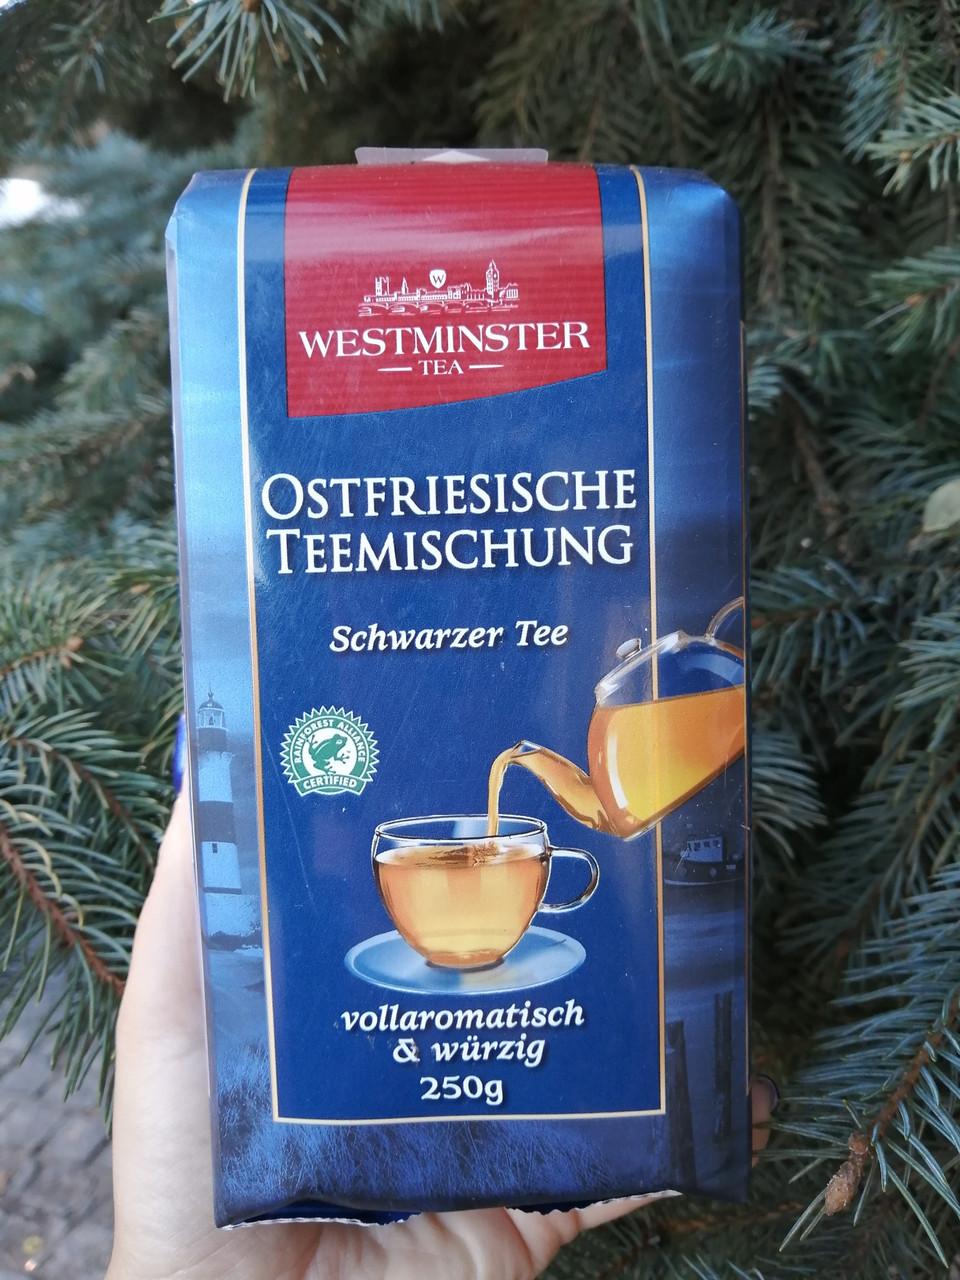 Westminster tea